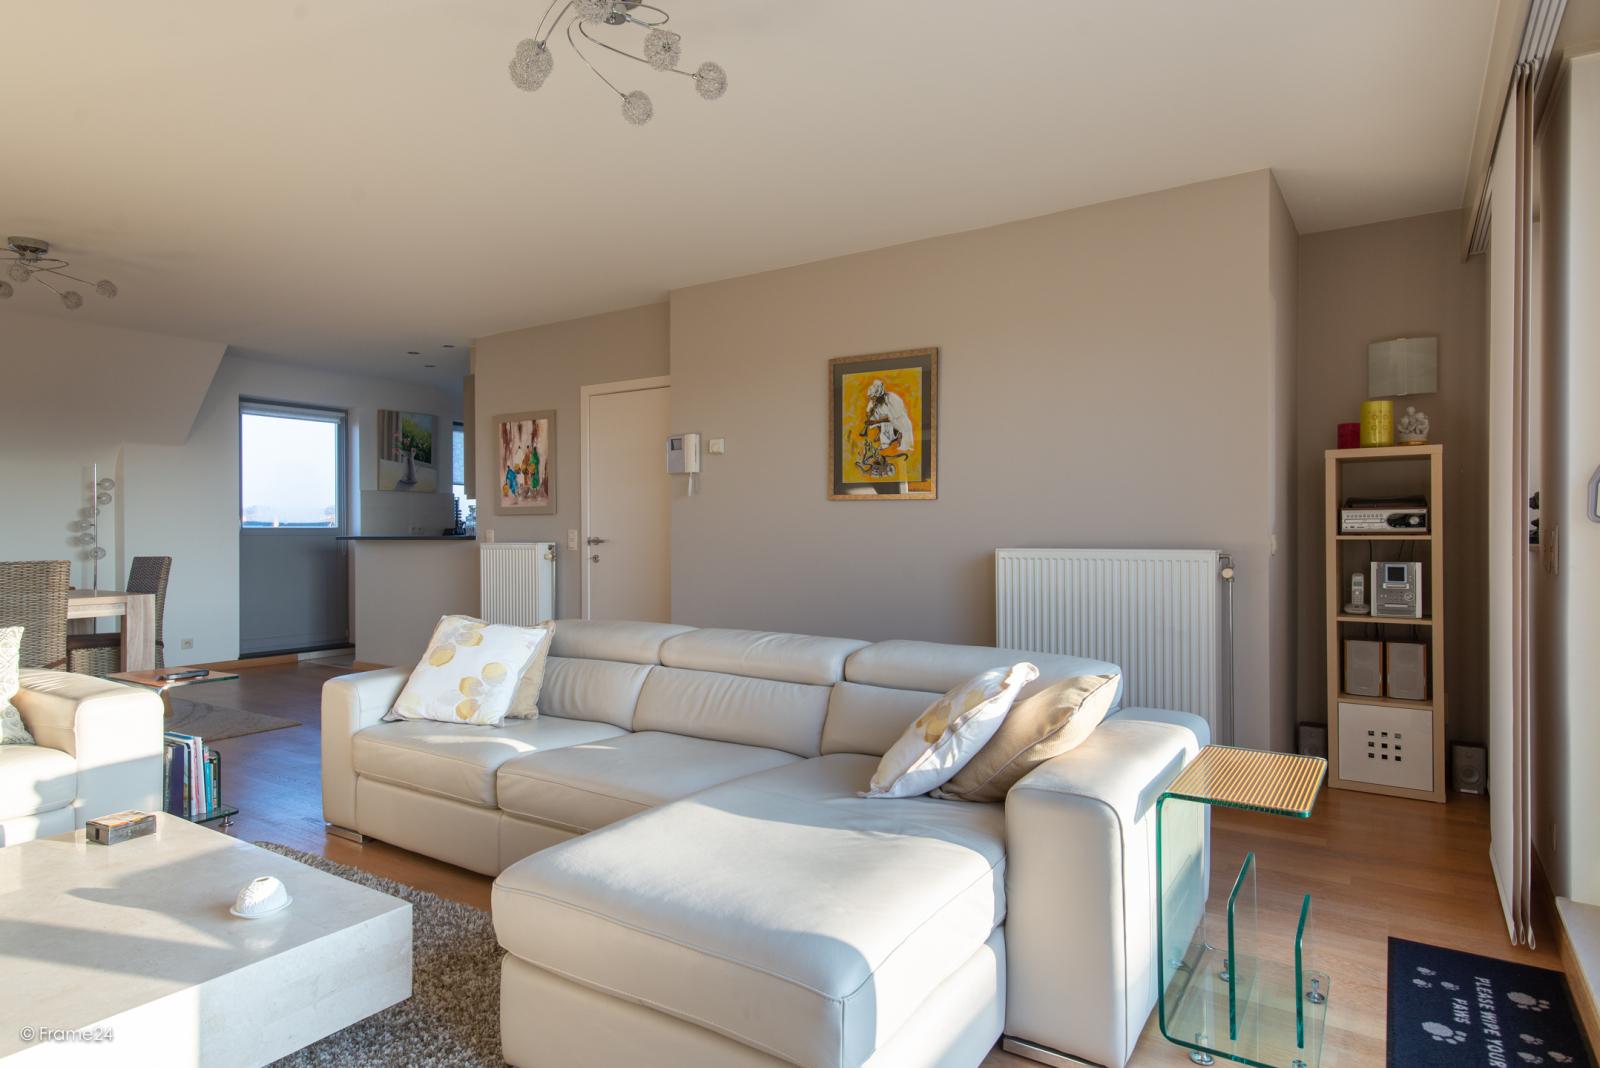 Riant dakappartement (130 m²) met zonnig terras in residentie 'Eyserhof' te Wijnegem! afbeelding 4